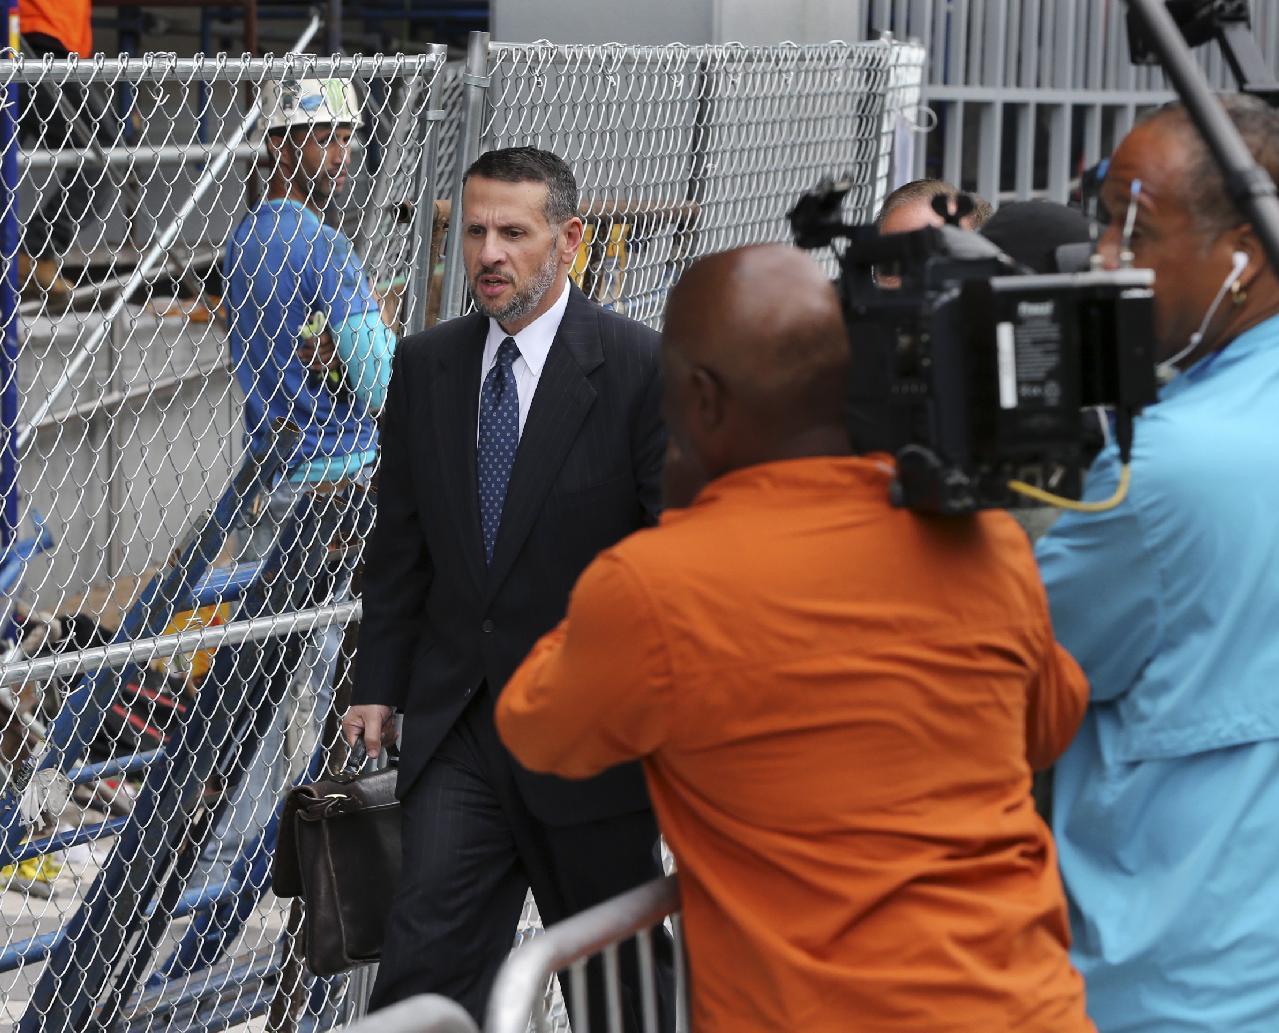 Gridlock made Christie happy, ex-ally says